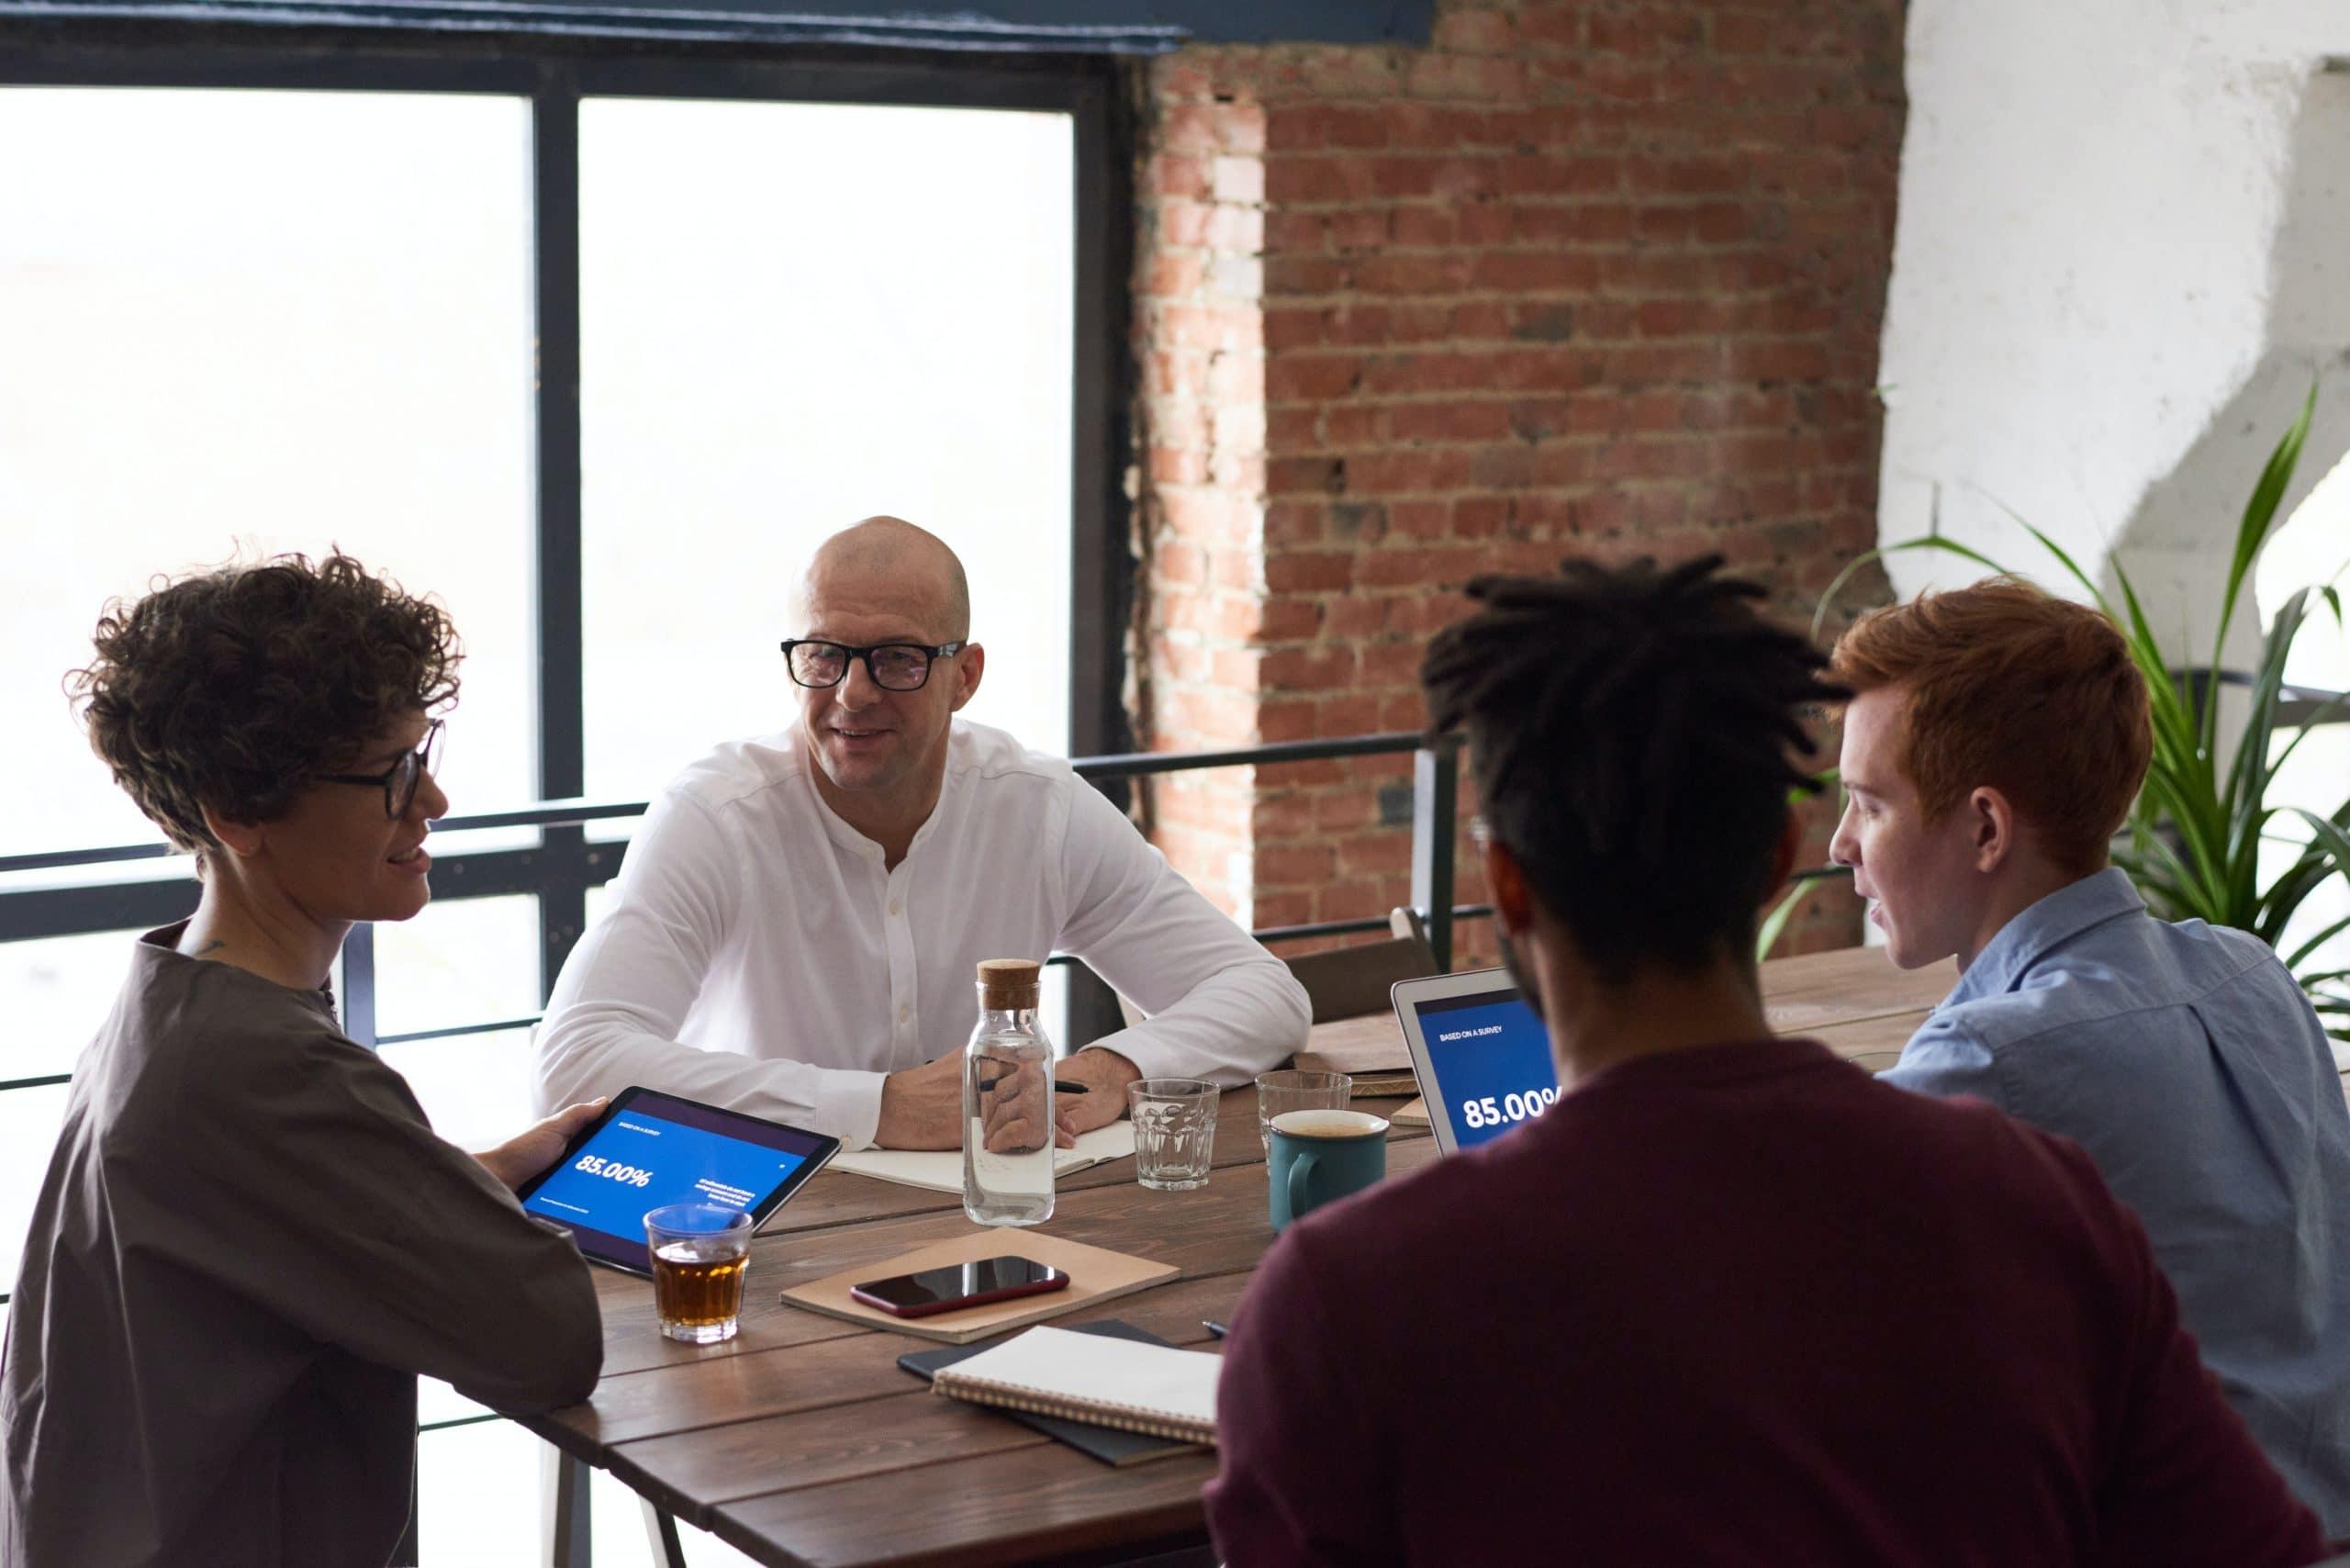 transactional vs relational business fecs scaled